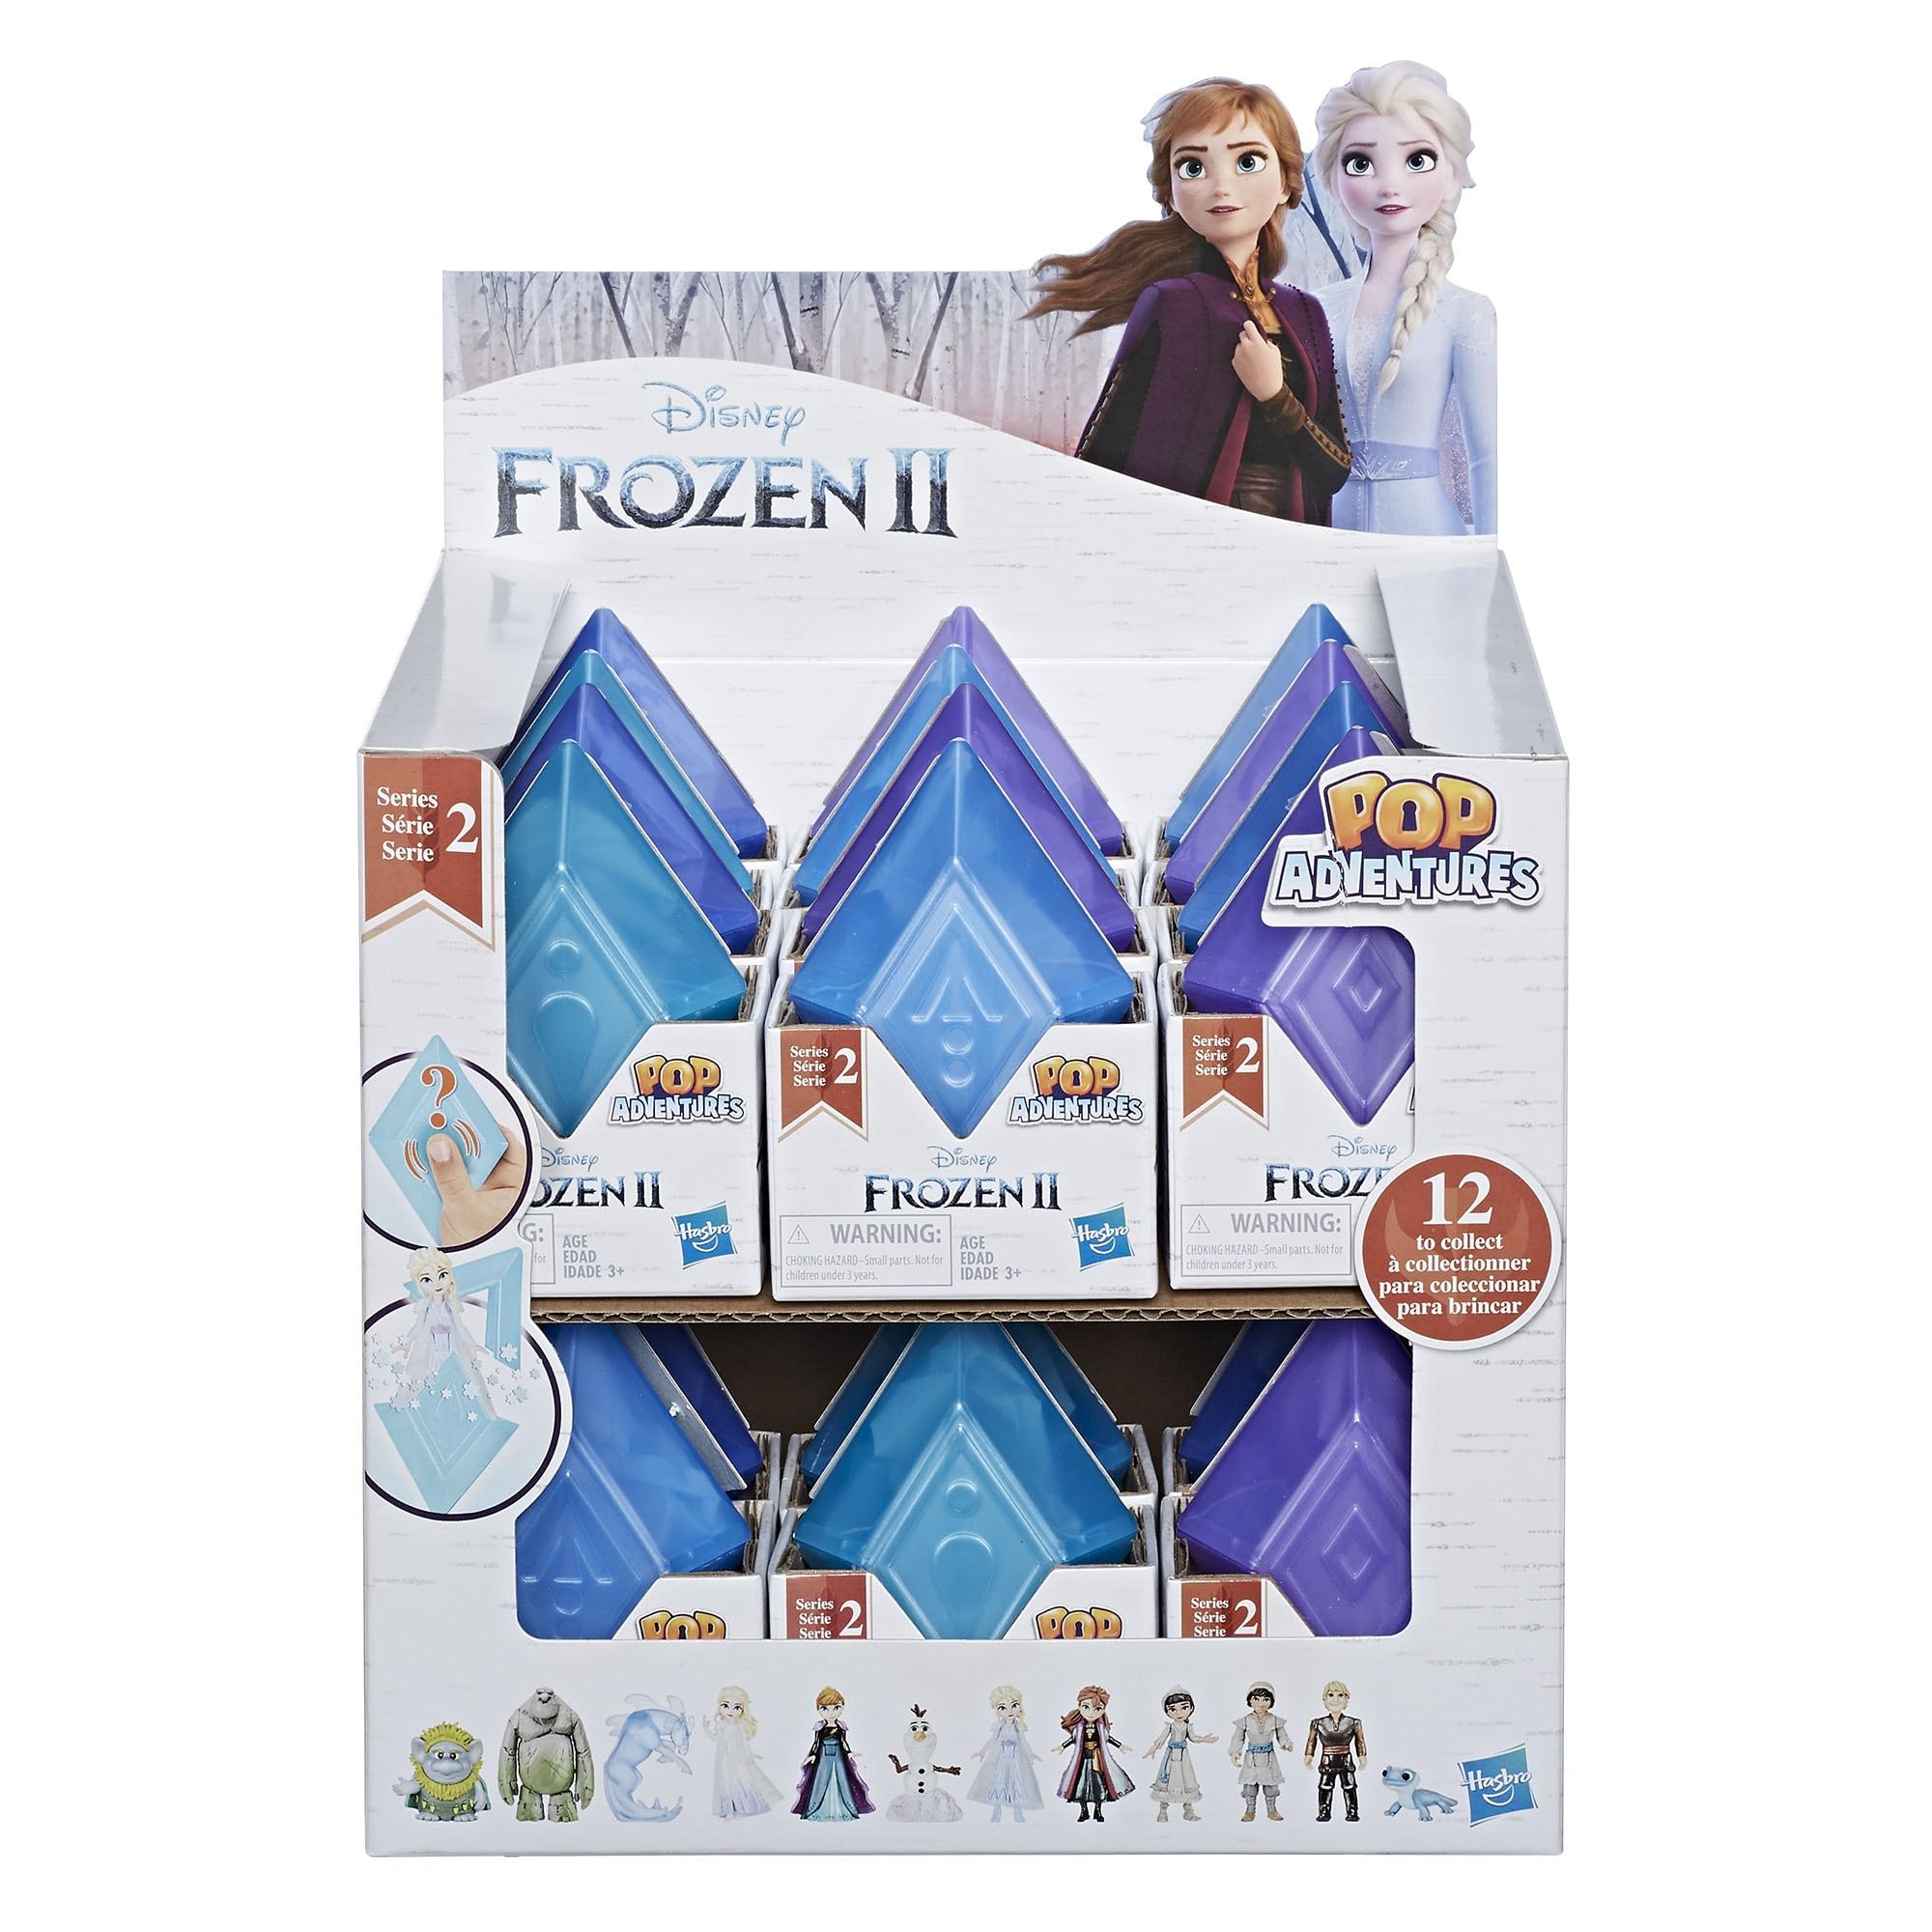 E7276 FRZ Pop Adventures Series 2 Blind Bags IP 2